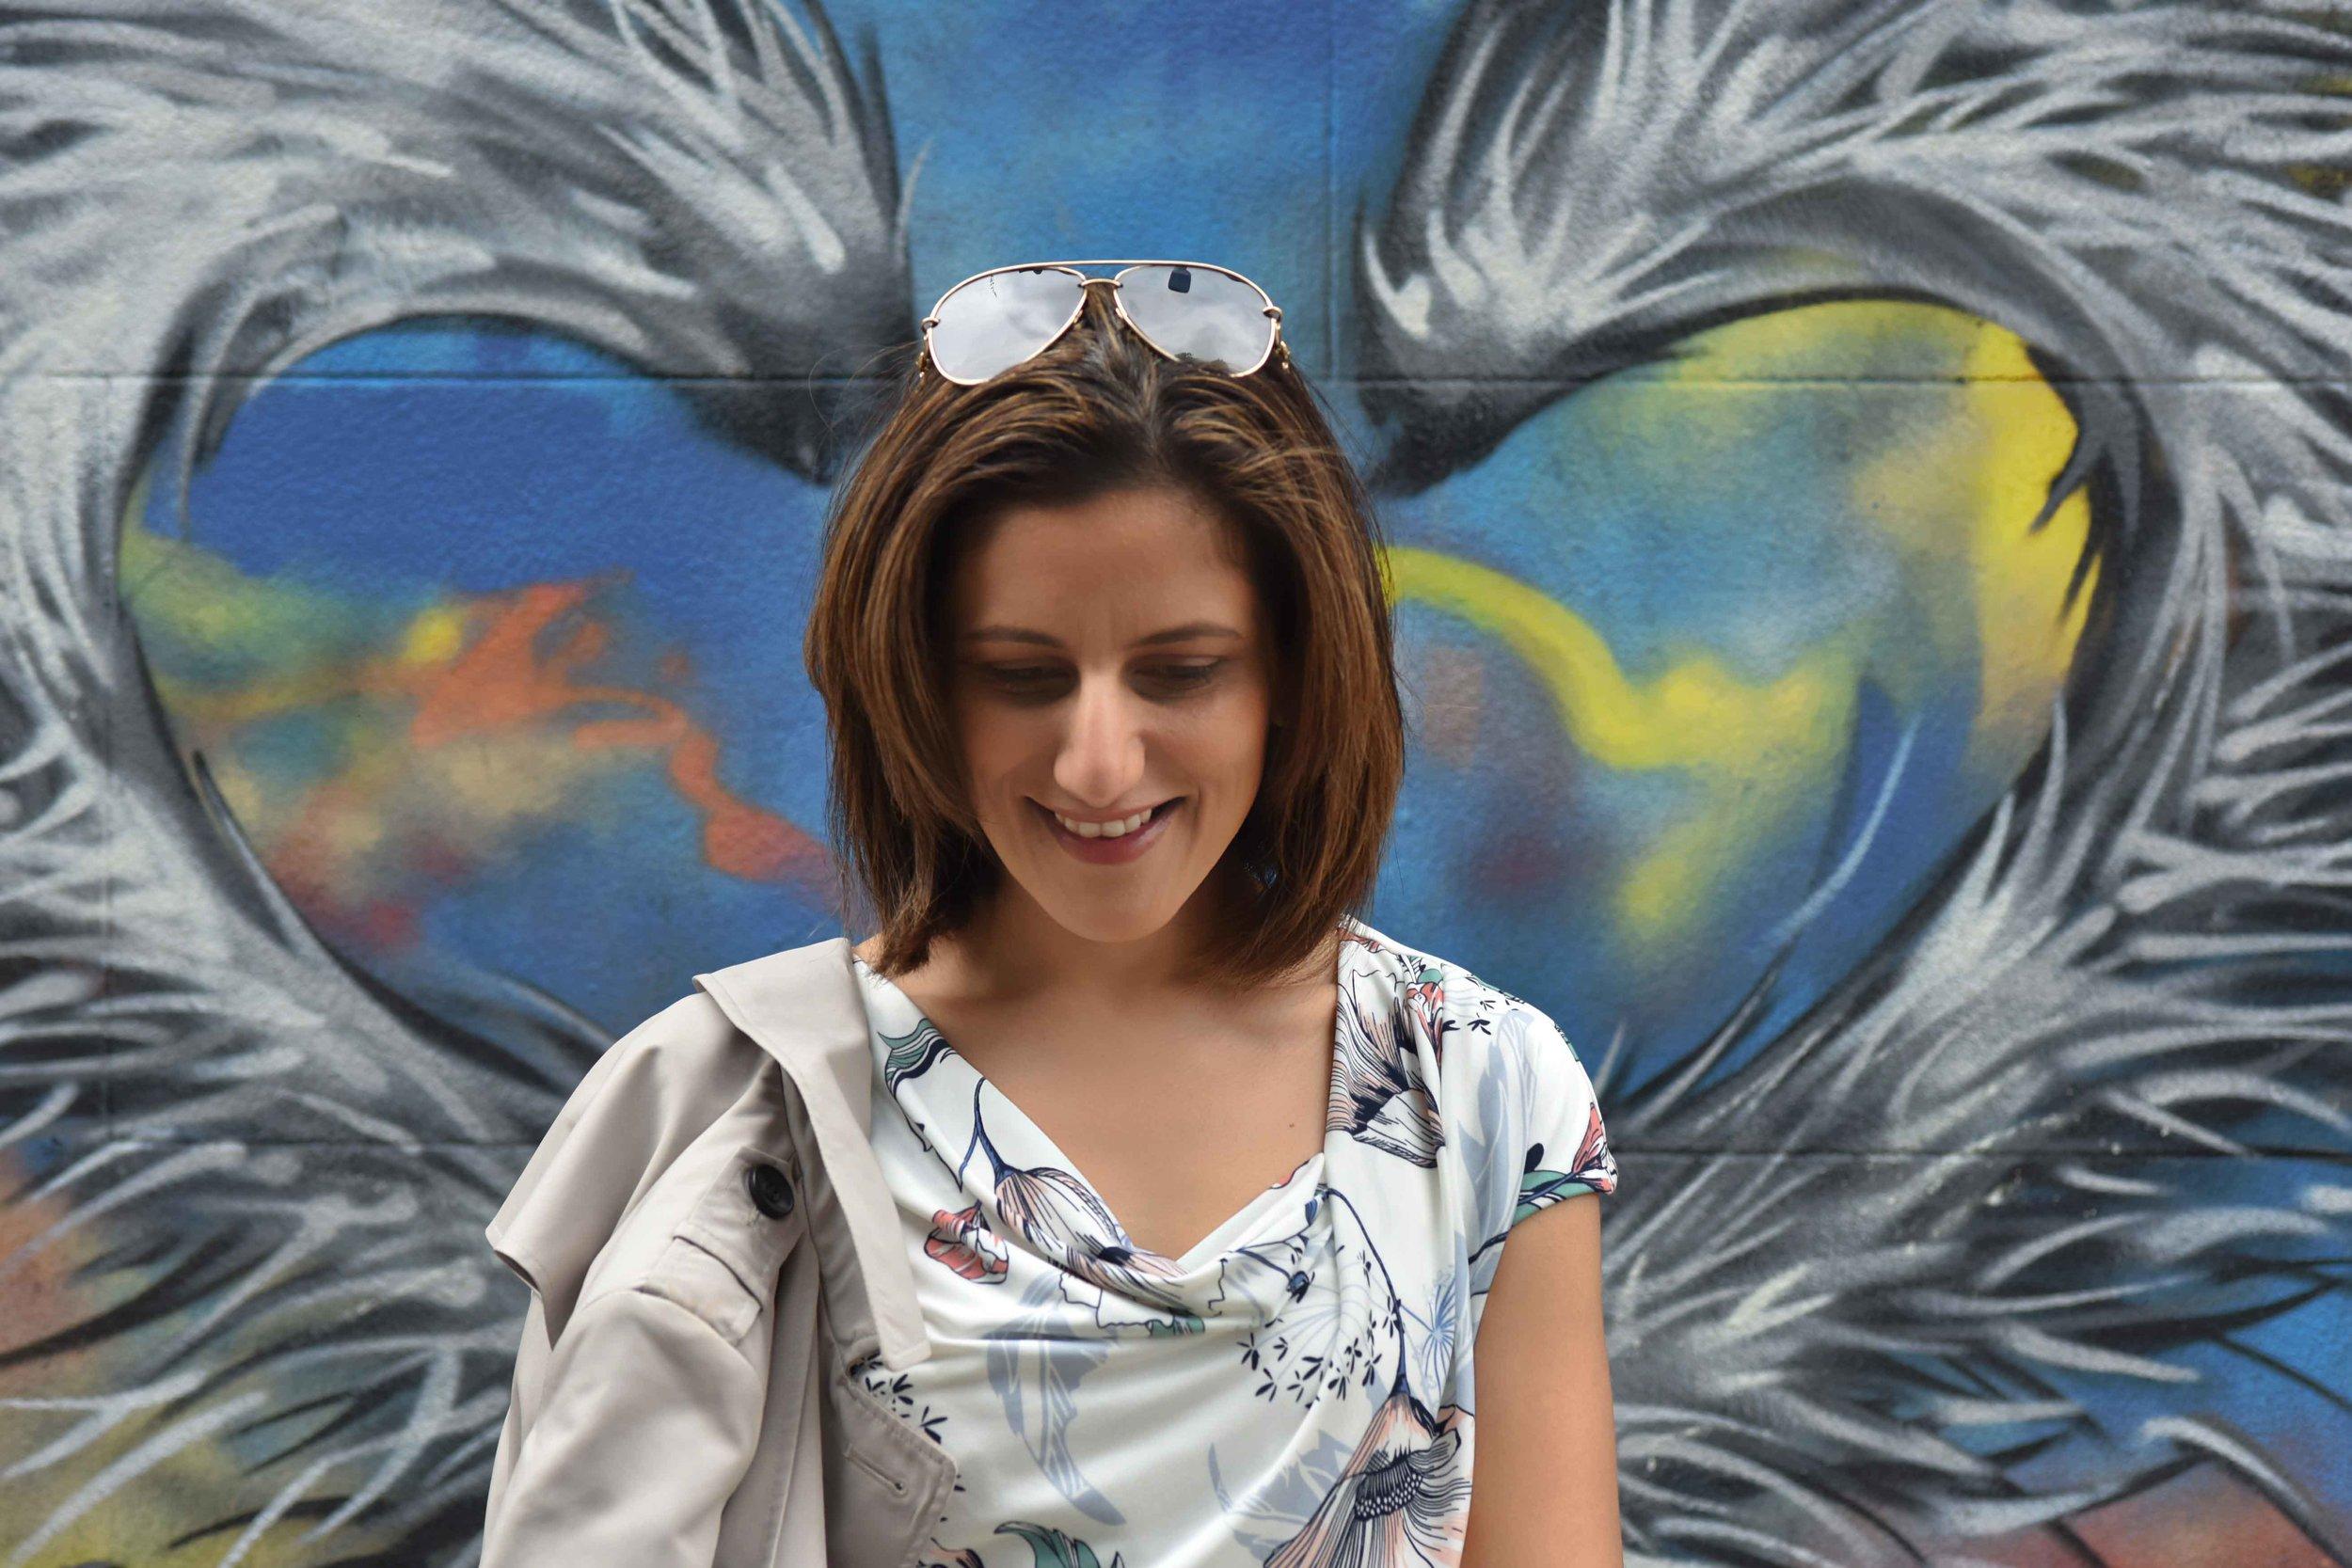 MNS dress, Graffiti artwork, Bricklane, street fashion, street art, Shoreditch, London, U.K. Photo: Nina Shaw, Image©sourcingstyle.com